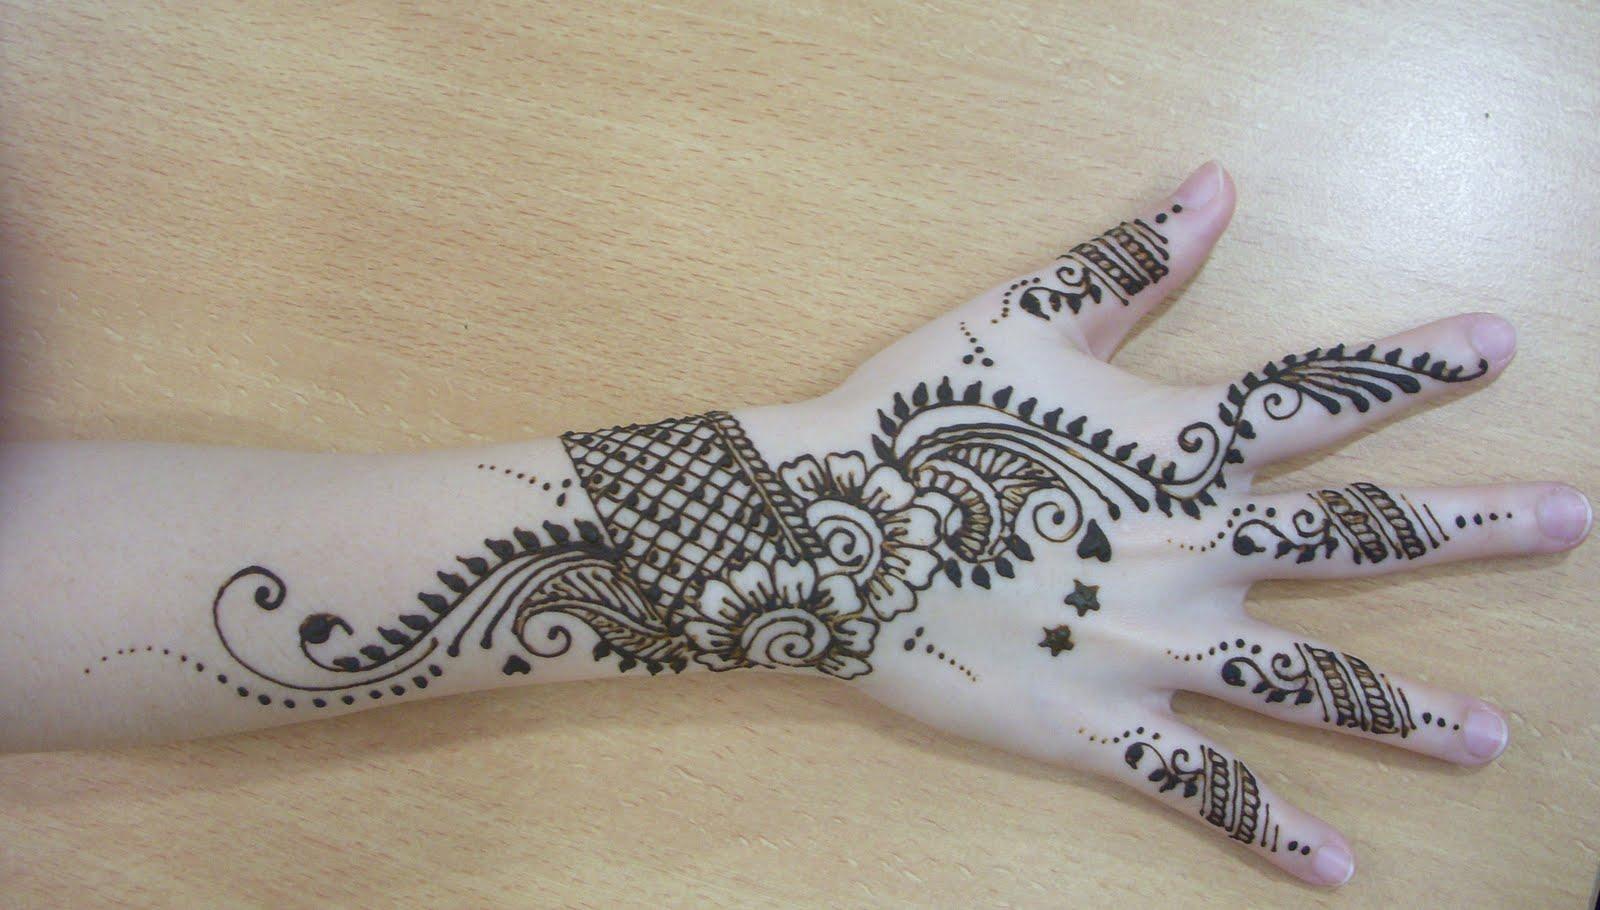 evershining star henna tattoos. Black Bedroom Furniture Sets. Home Design Ideas